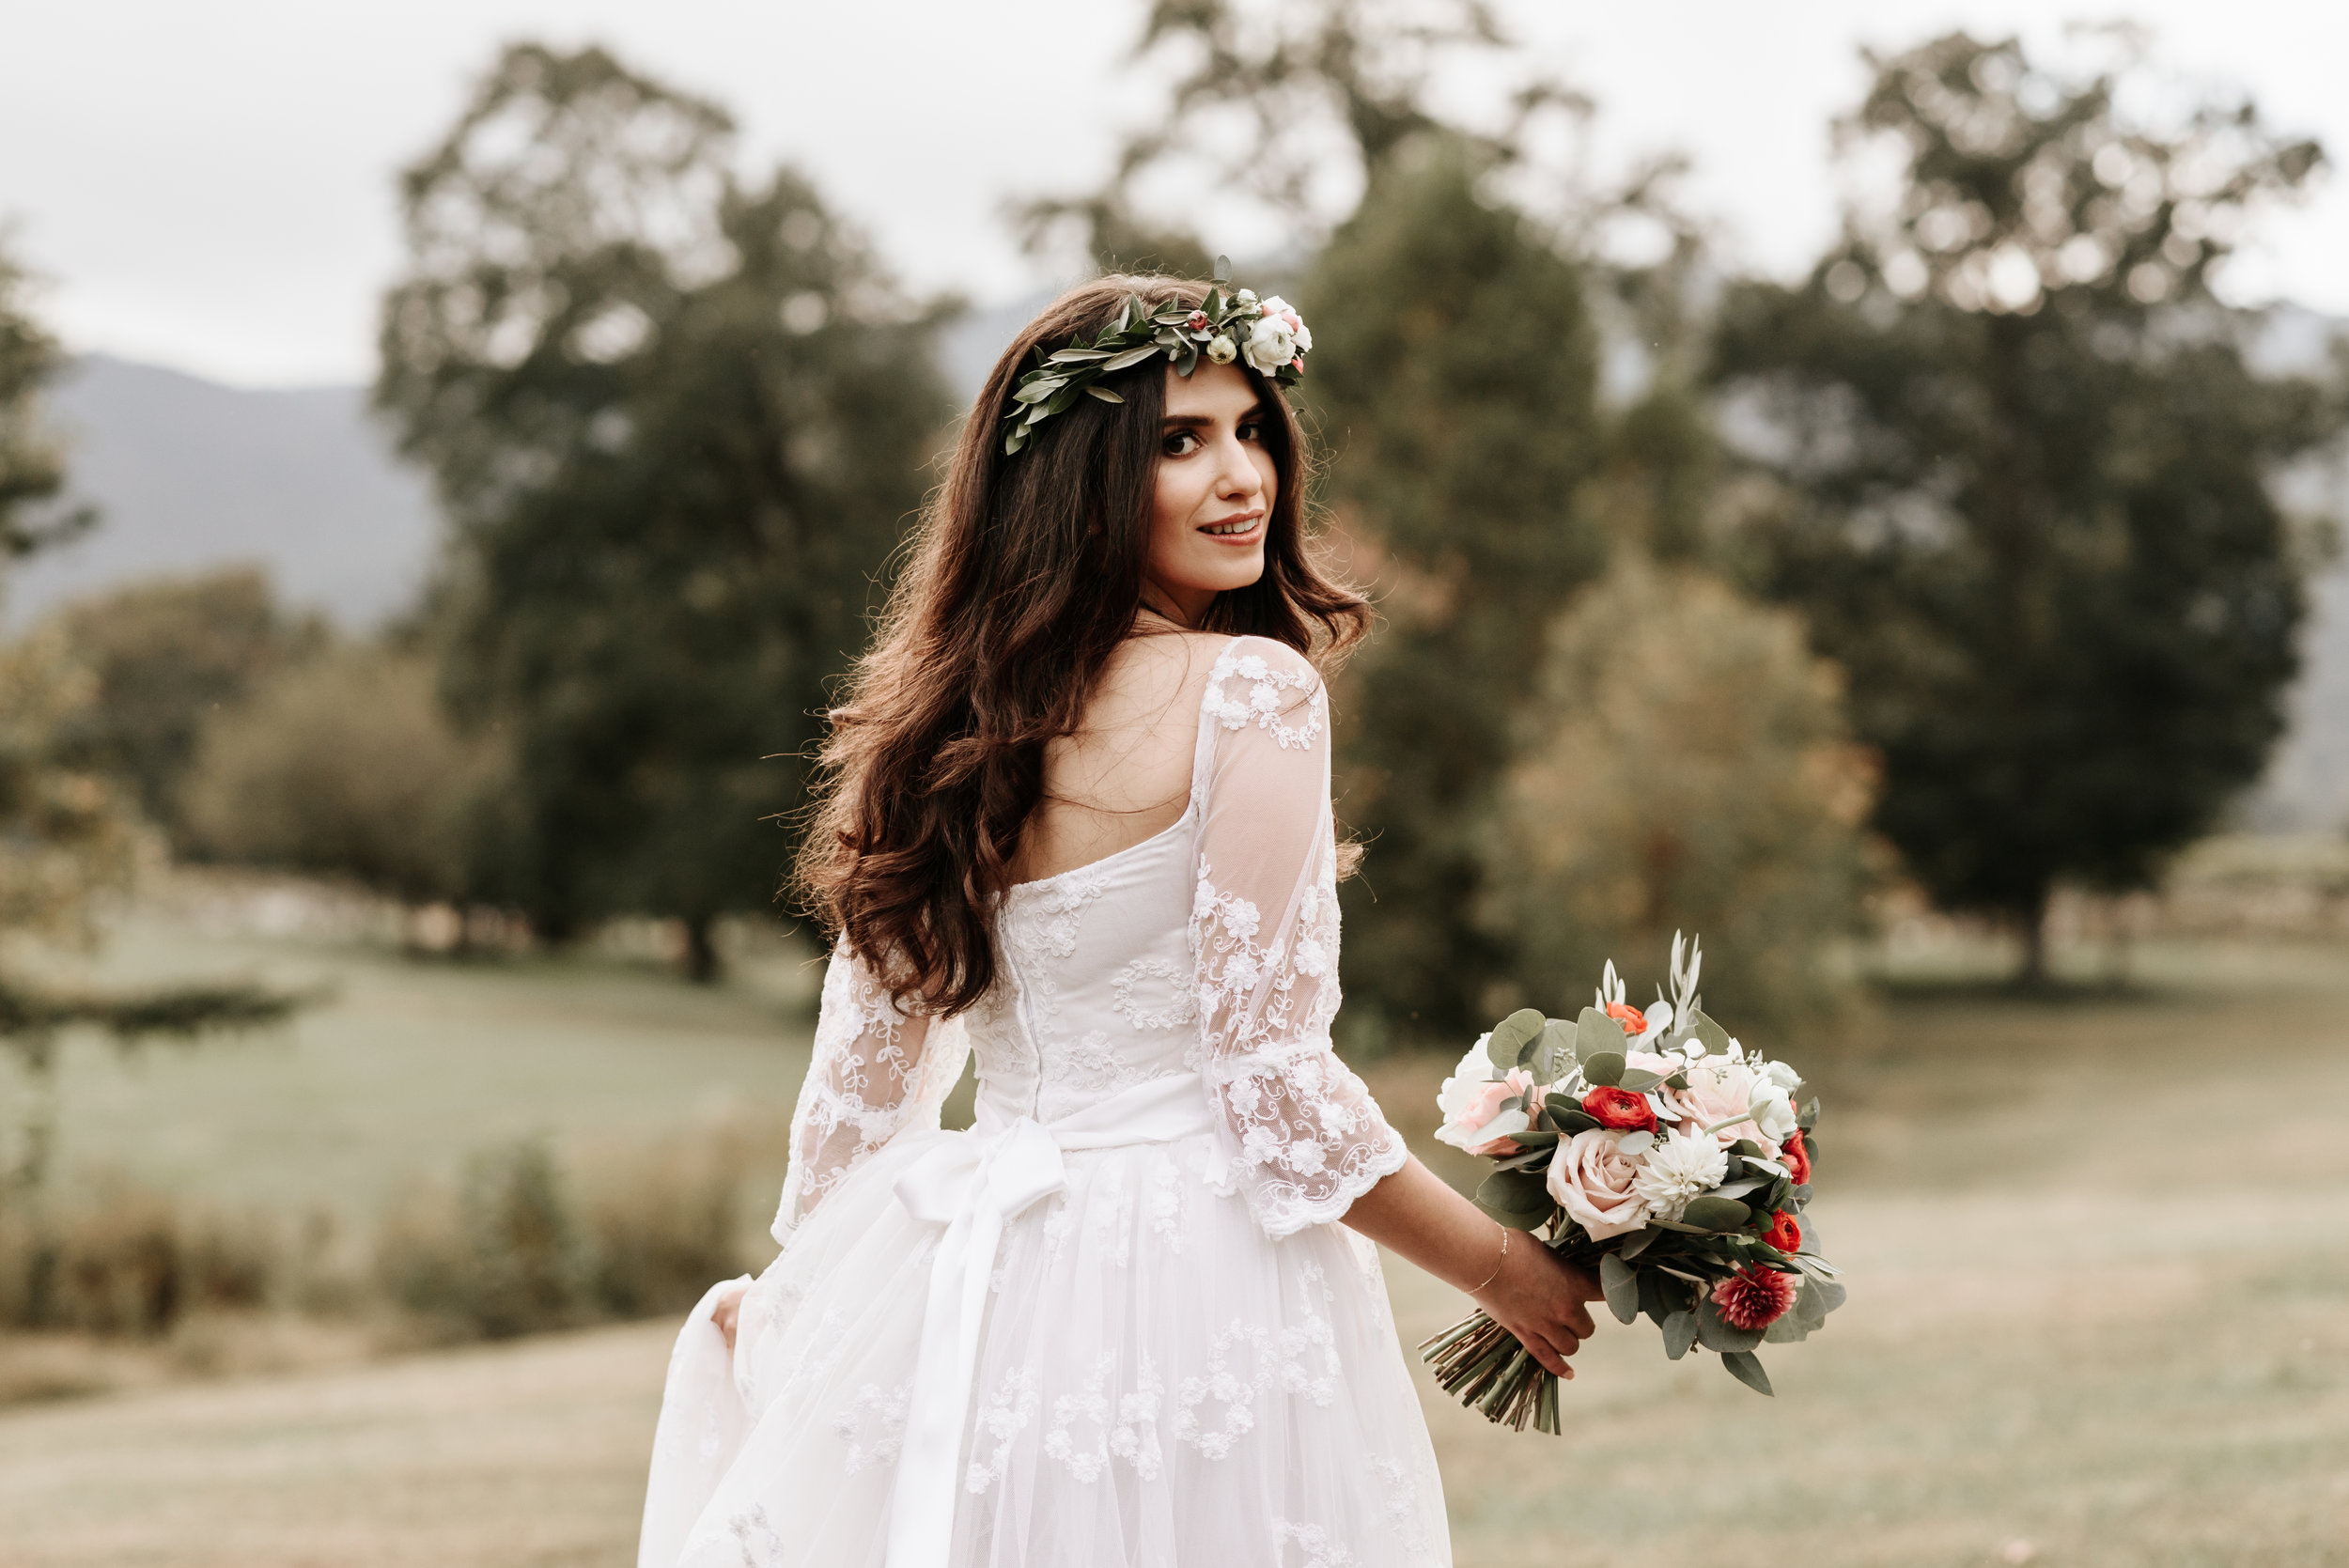 Veritas-Vineyards-and-Winery-Wedding-Photography-Afton-Virginia-Yasmin-Seth-Photography-by-V-2484.jpg